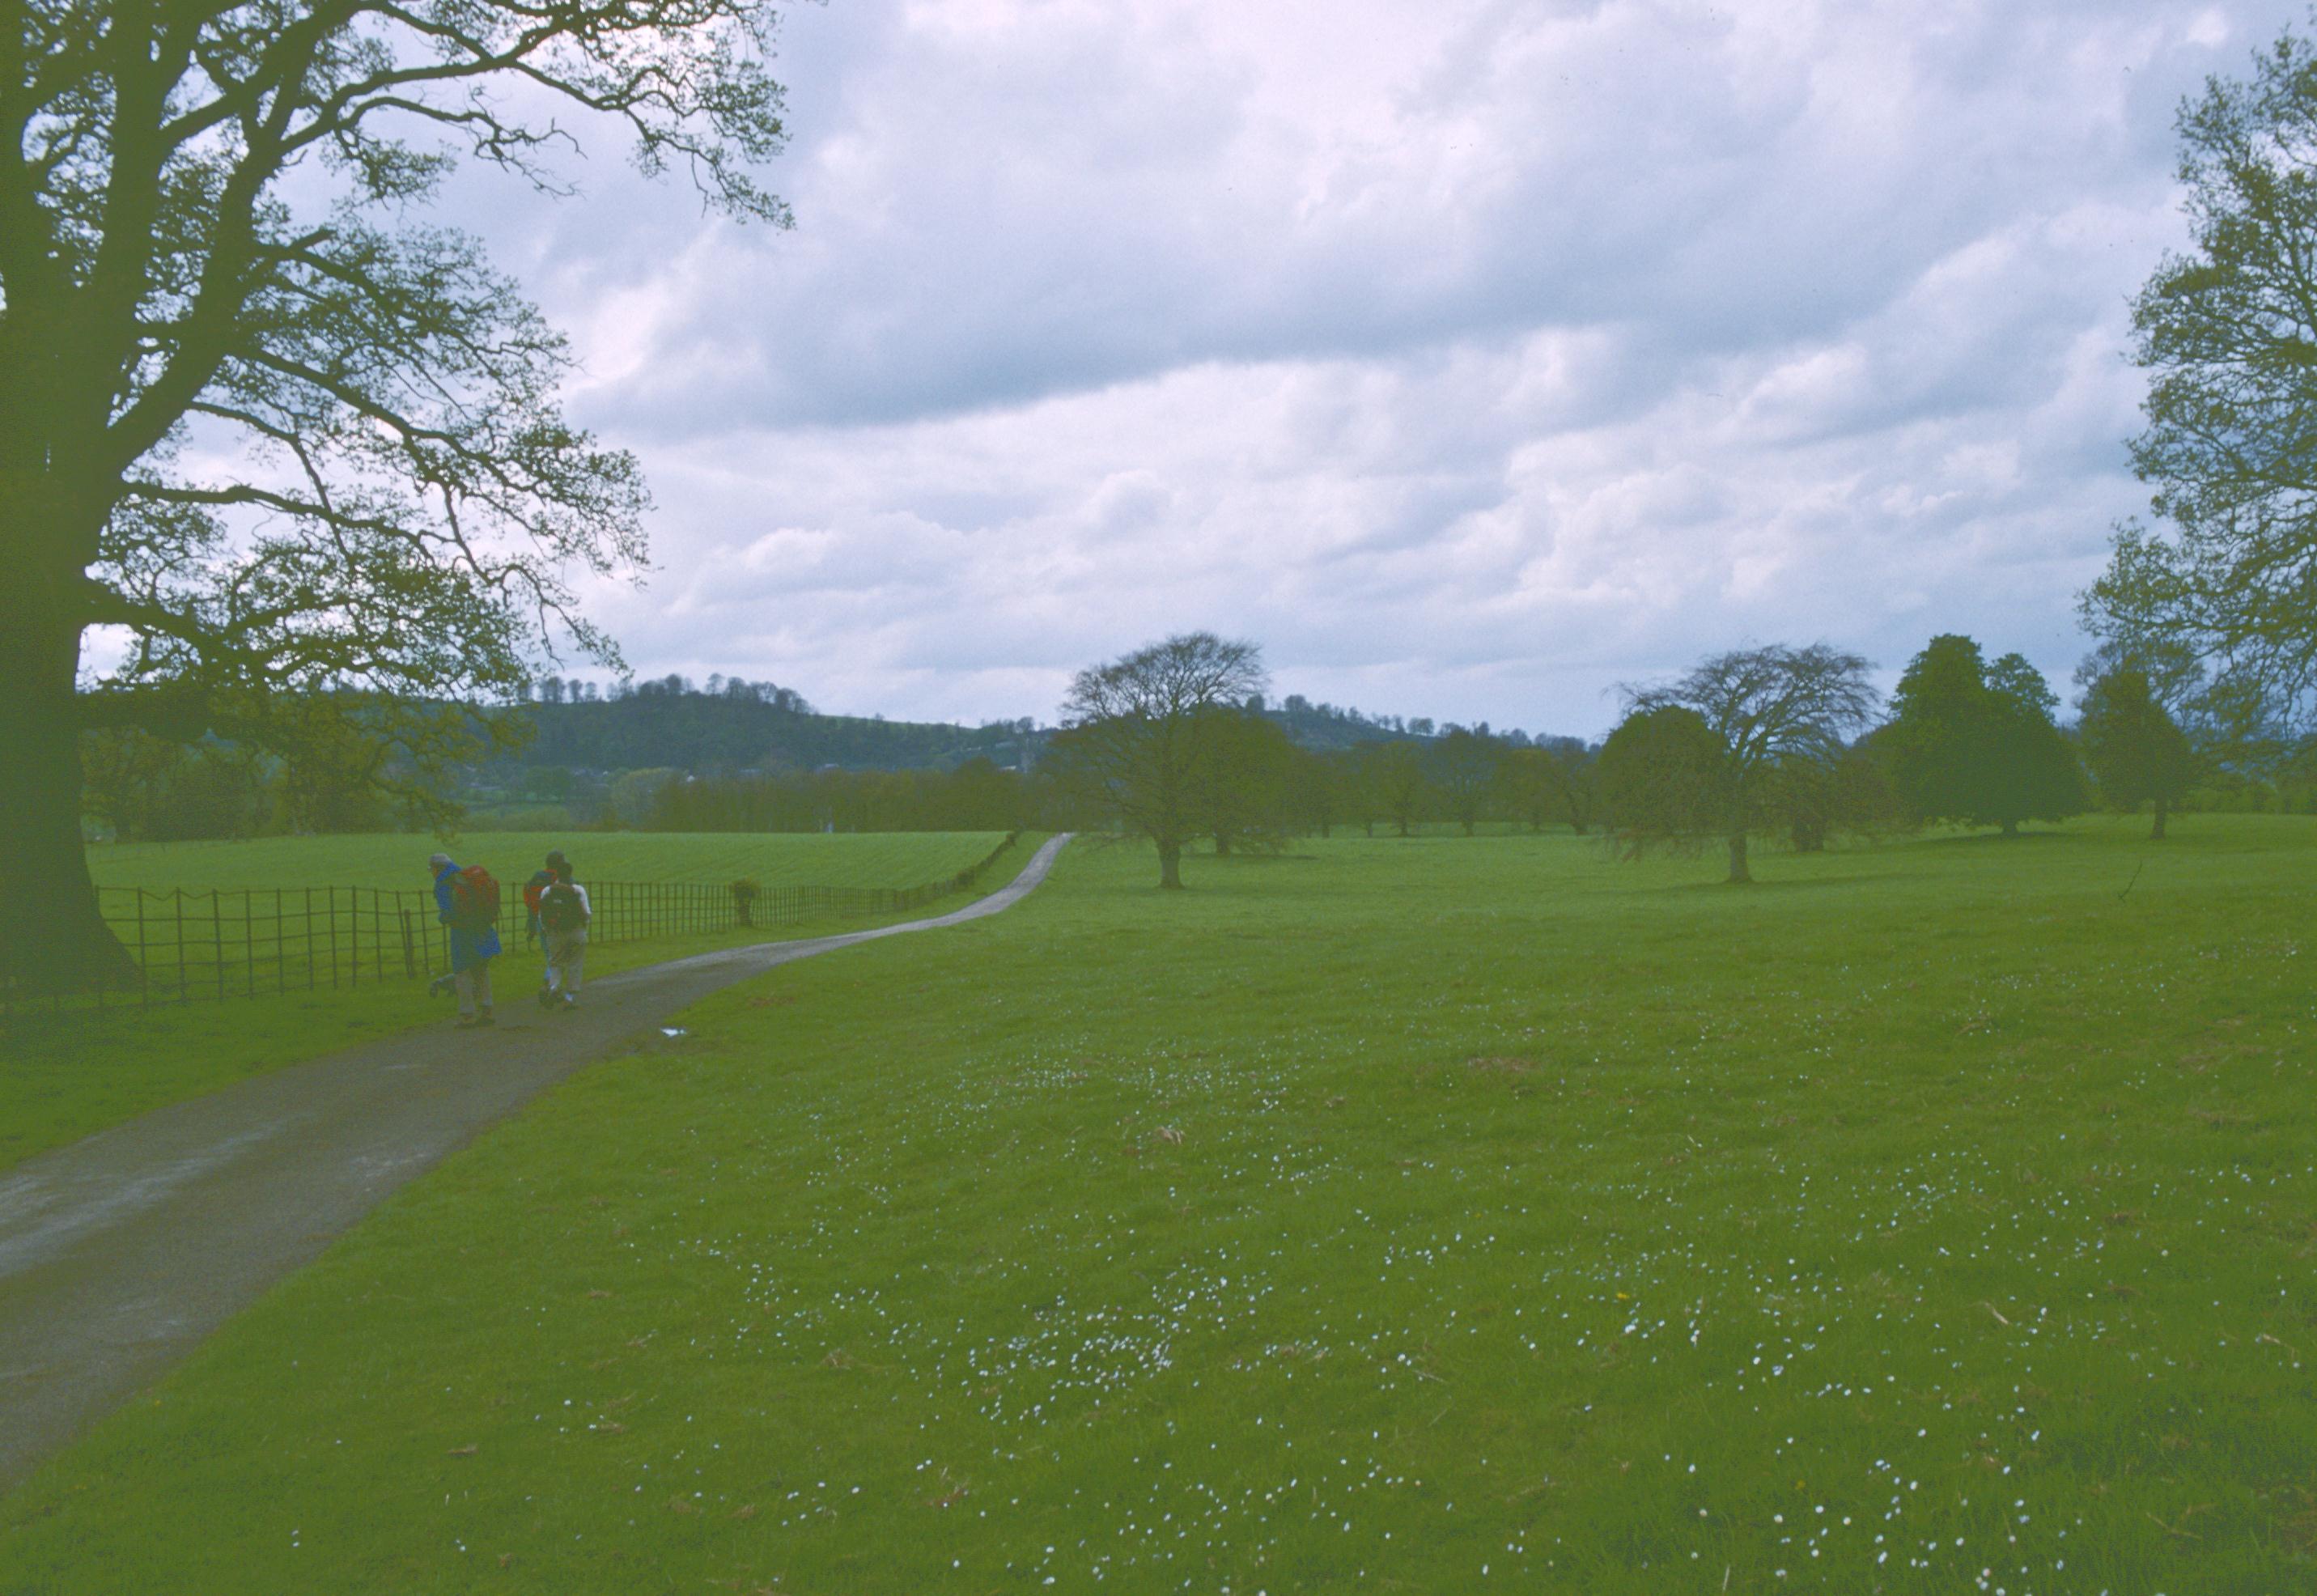 In Lymore Park